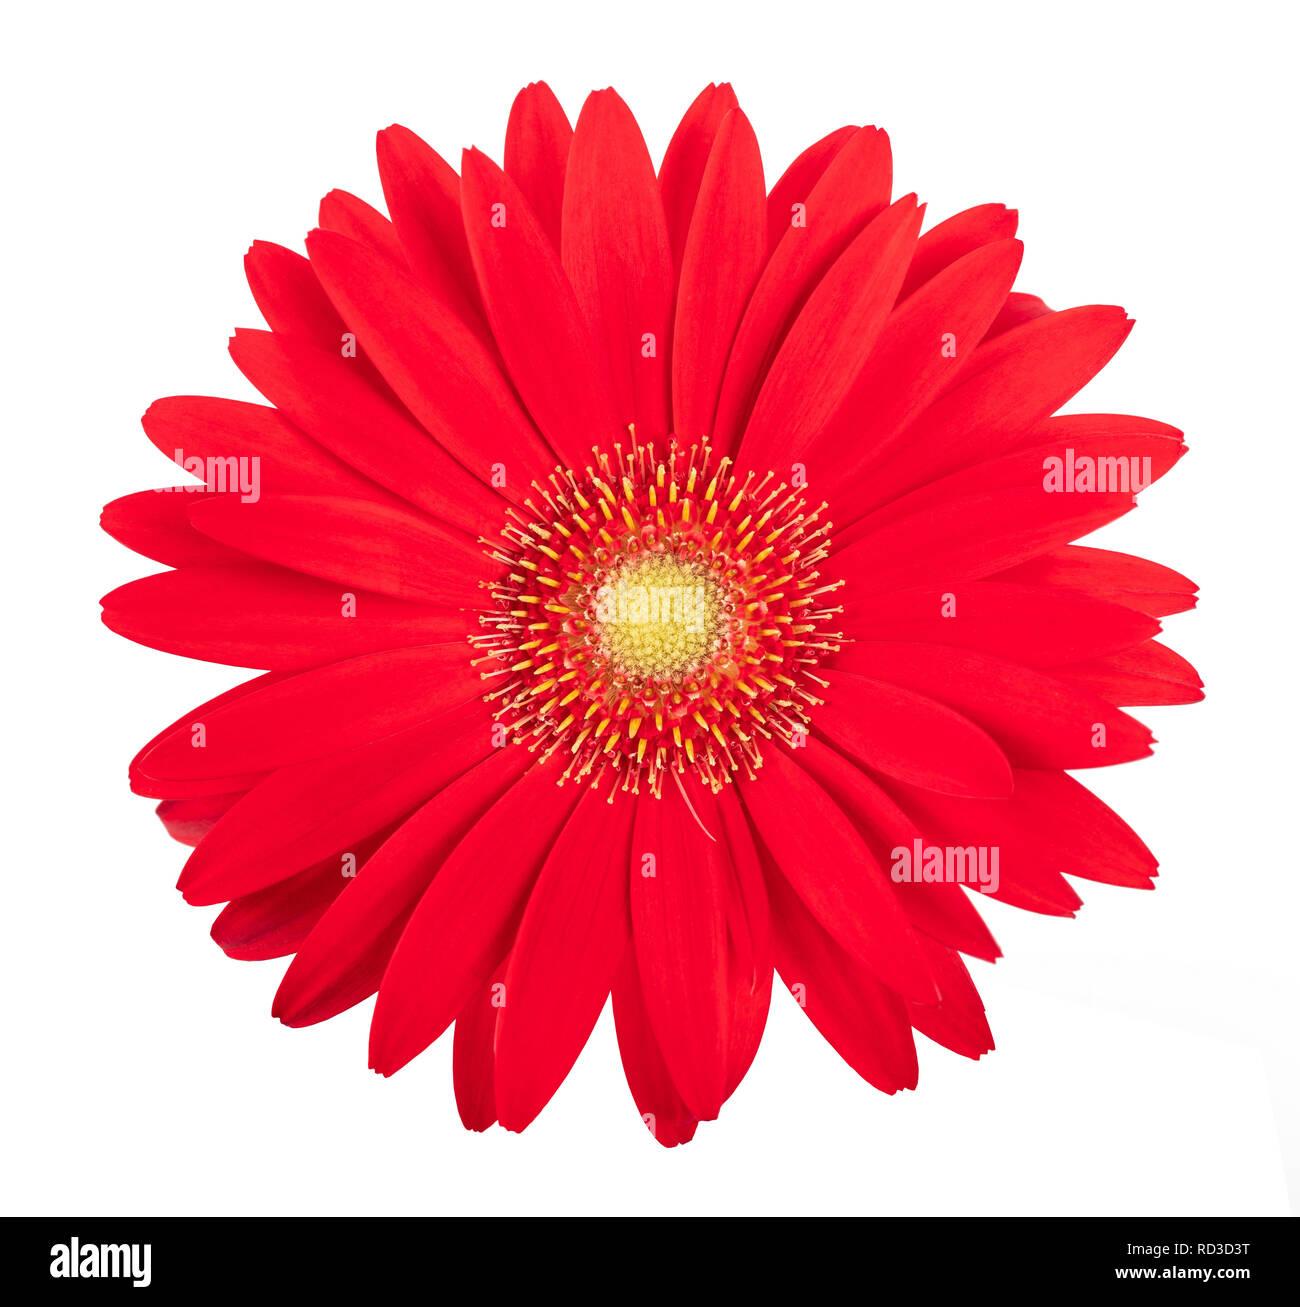 Gerbera flower isolated on white background Stock Photo